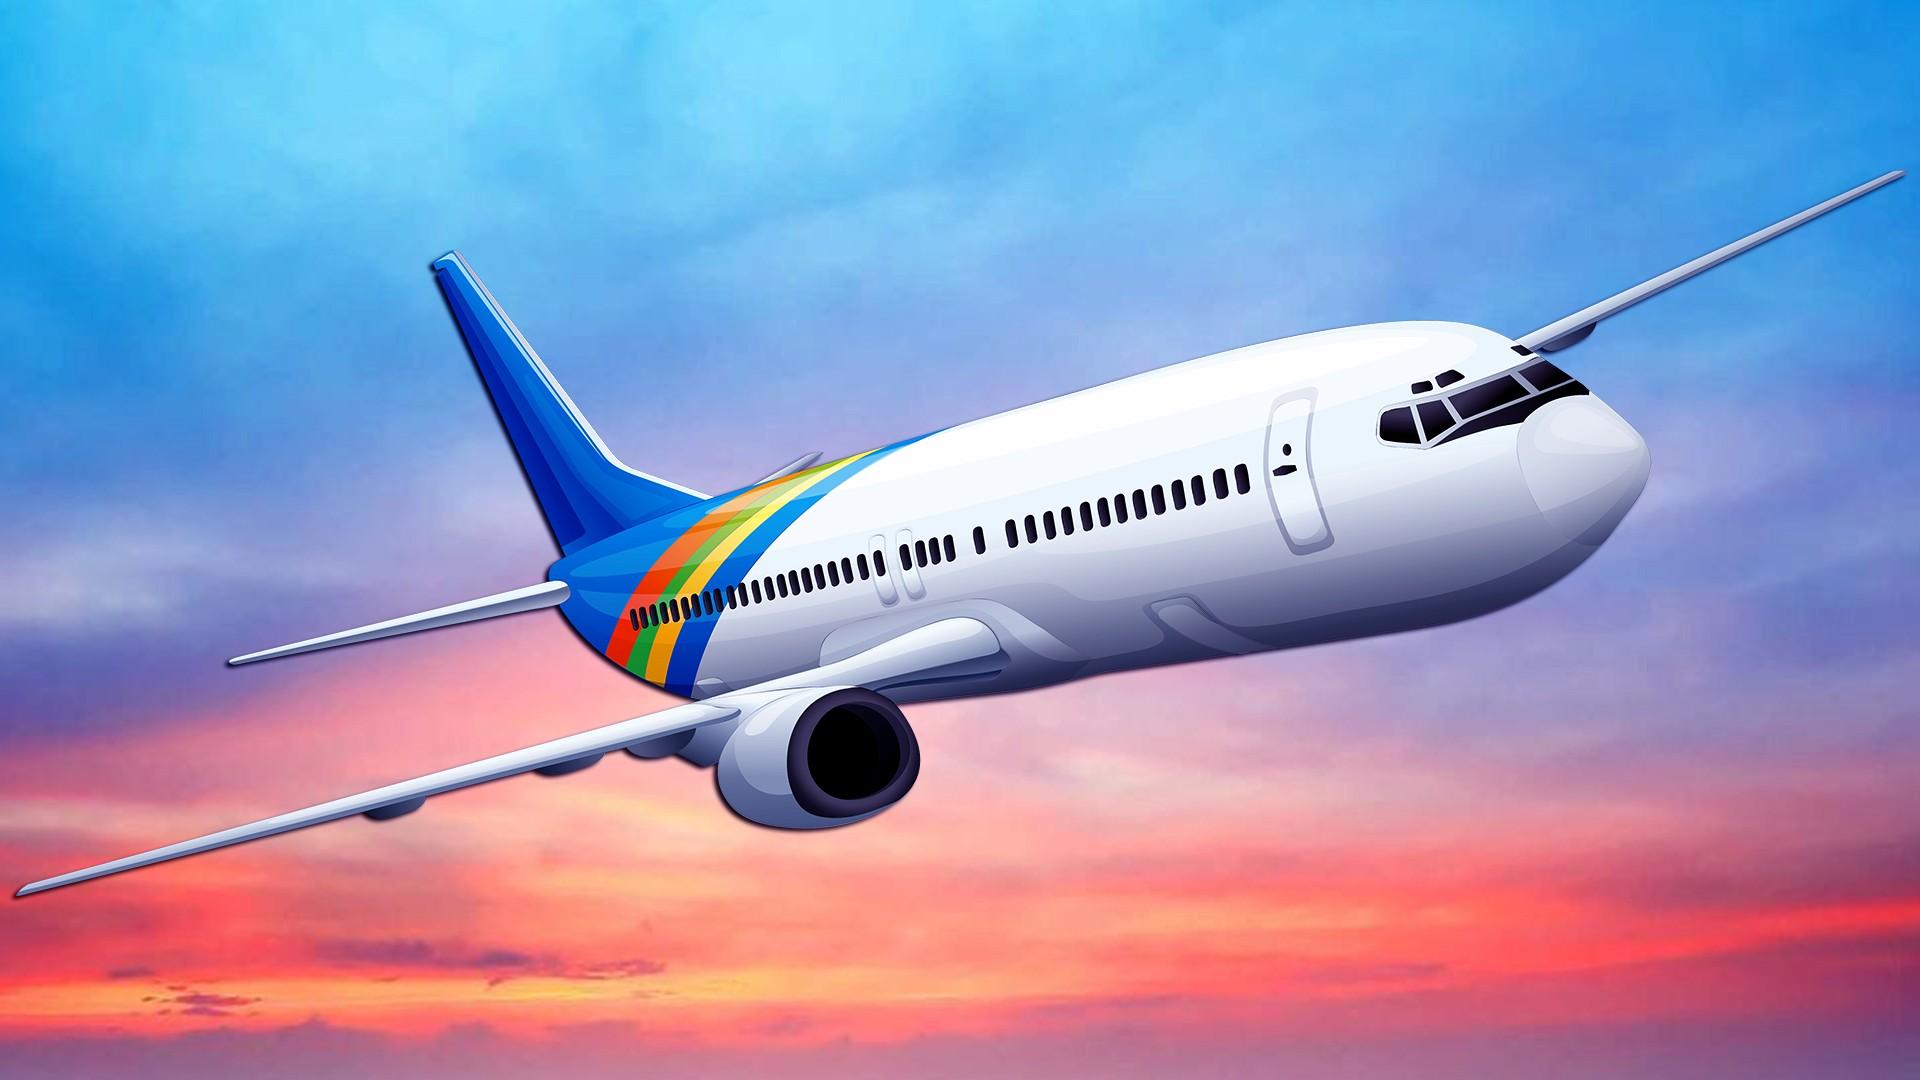 Download Airplane Desktop Wallpaper Hd Backgrounds Download